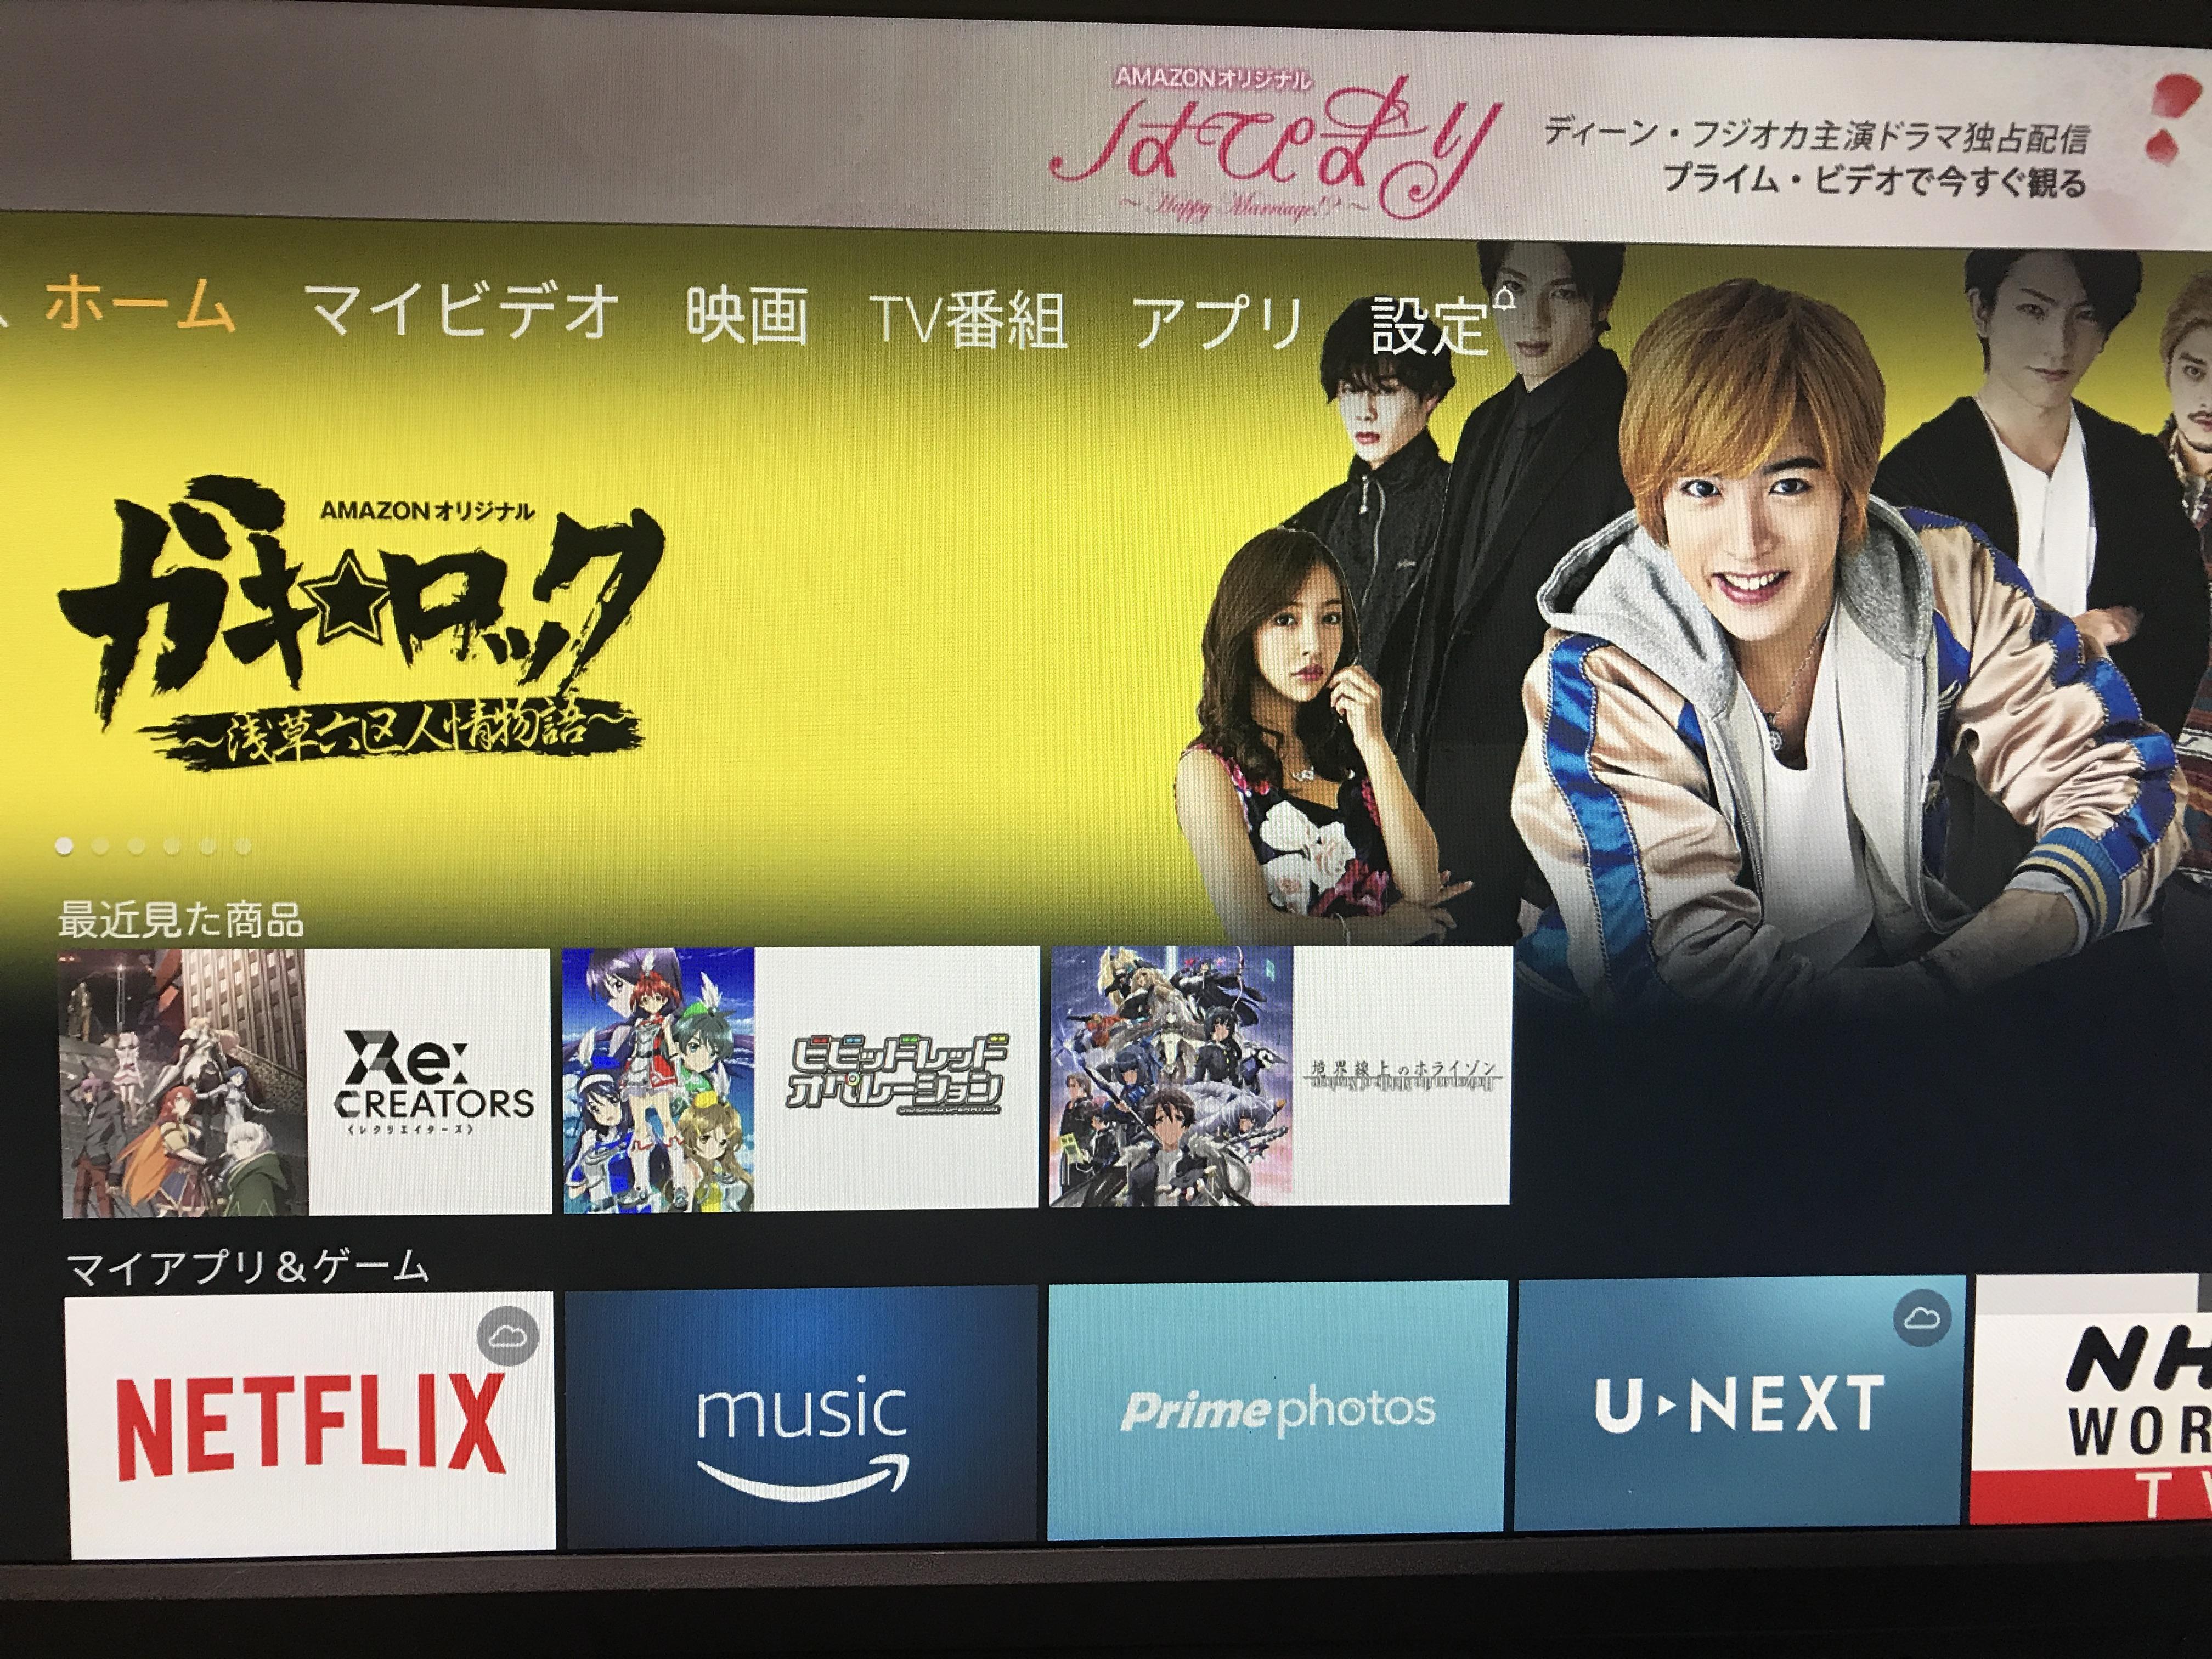 http://konozama.jp/amazon_devil/photo/20170415_042023814_iOS.jpg